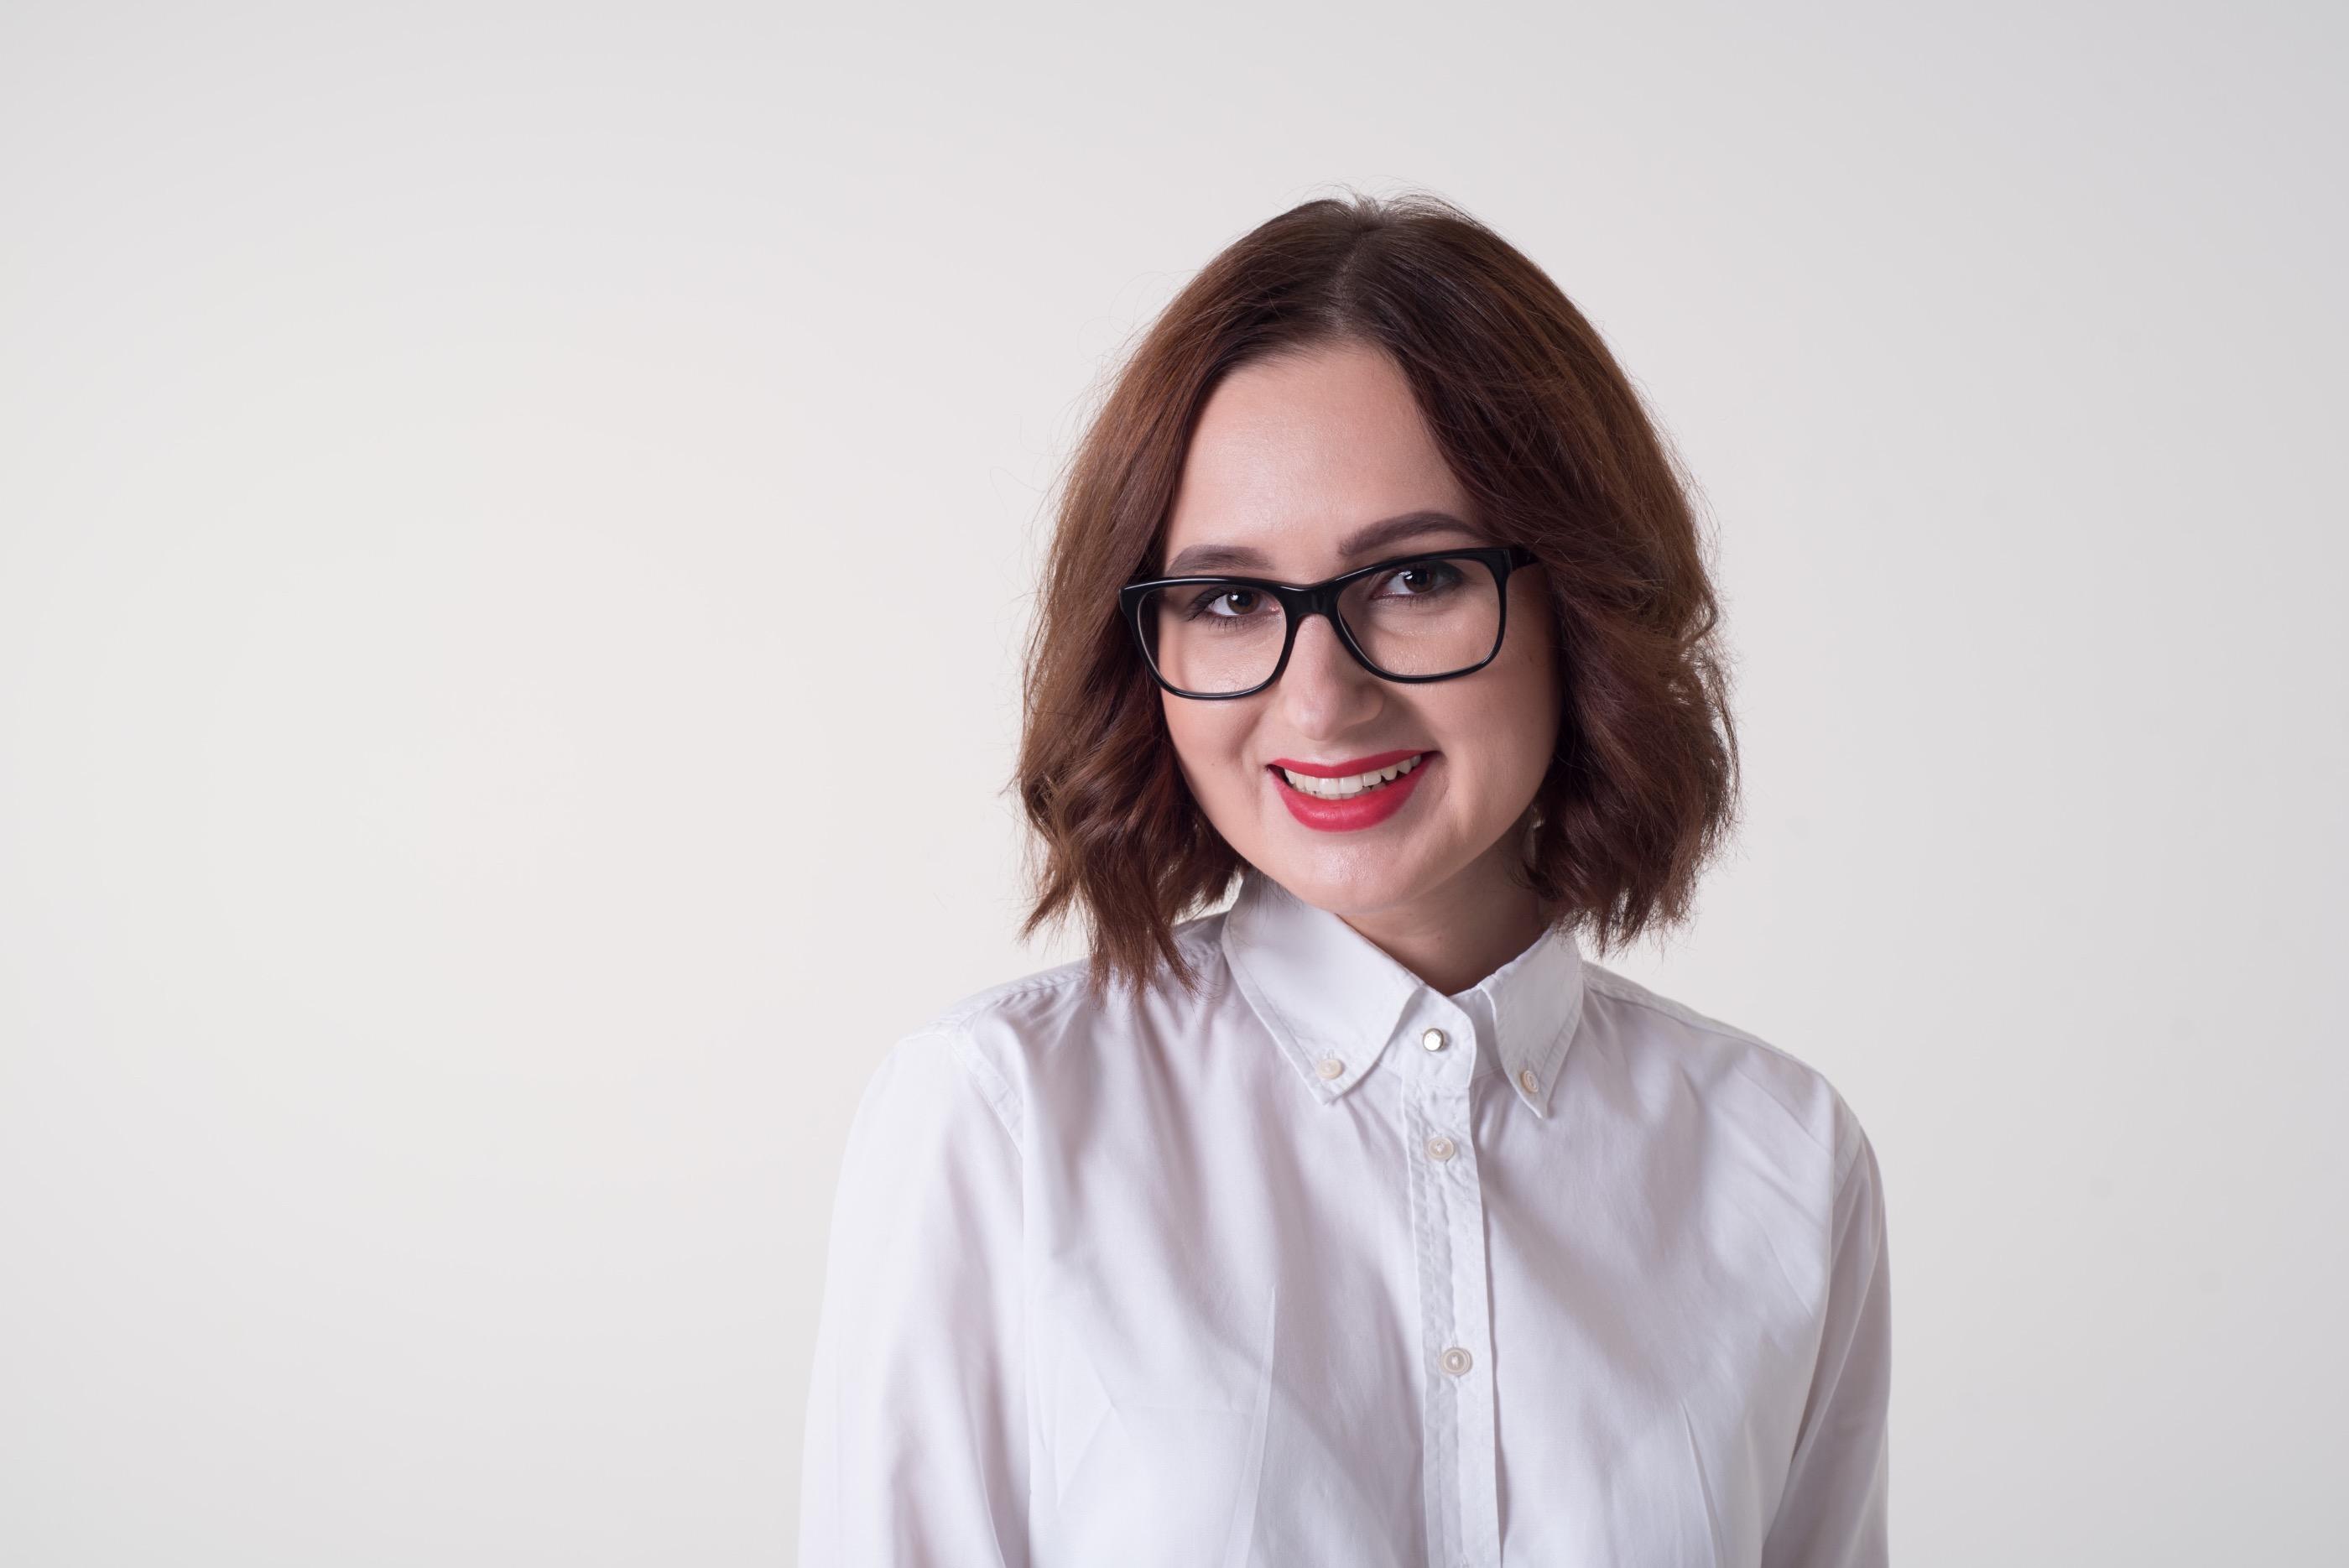 Кристина Немчинова